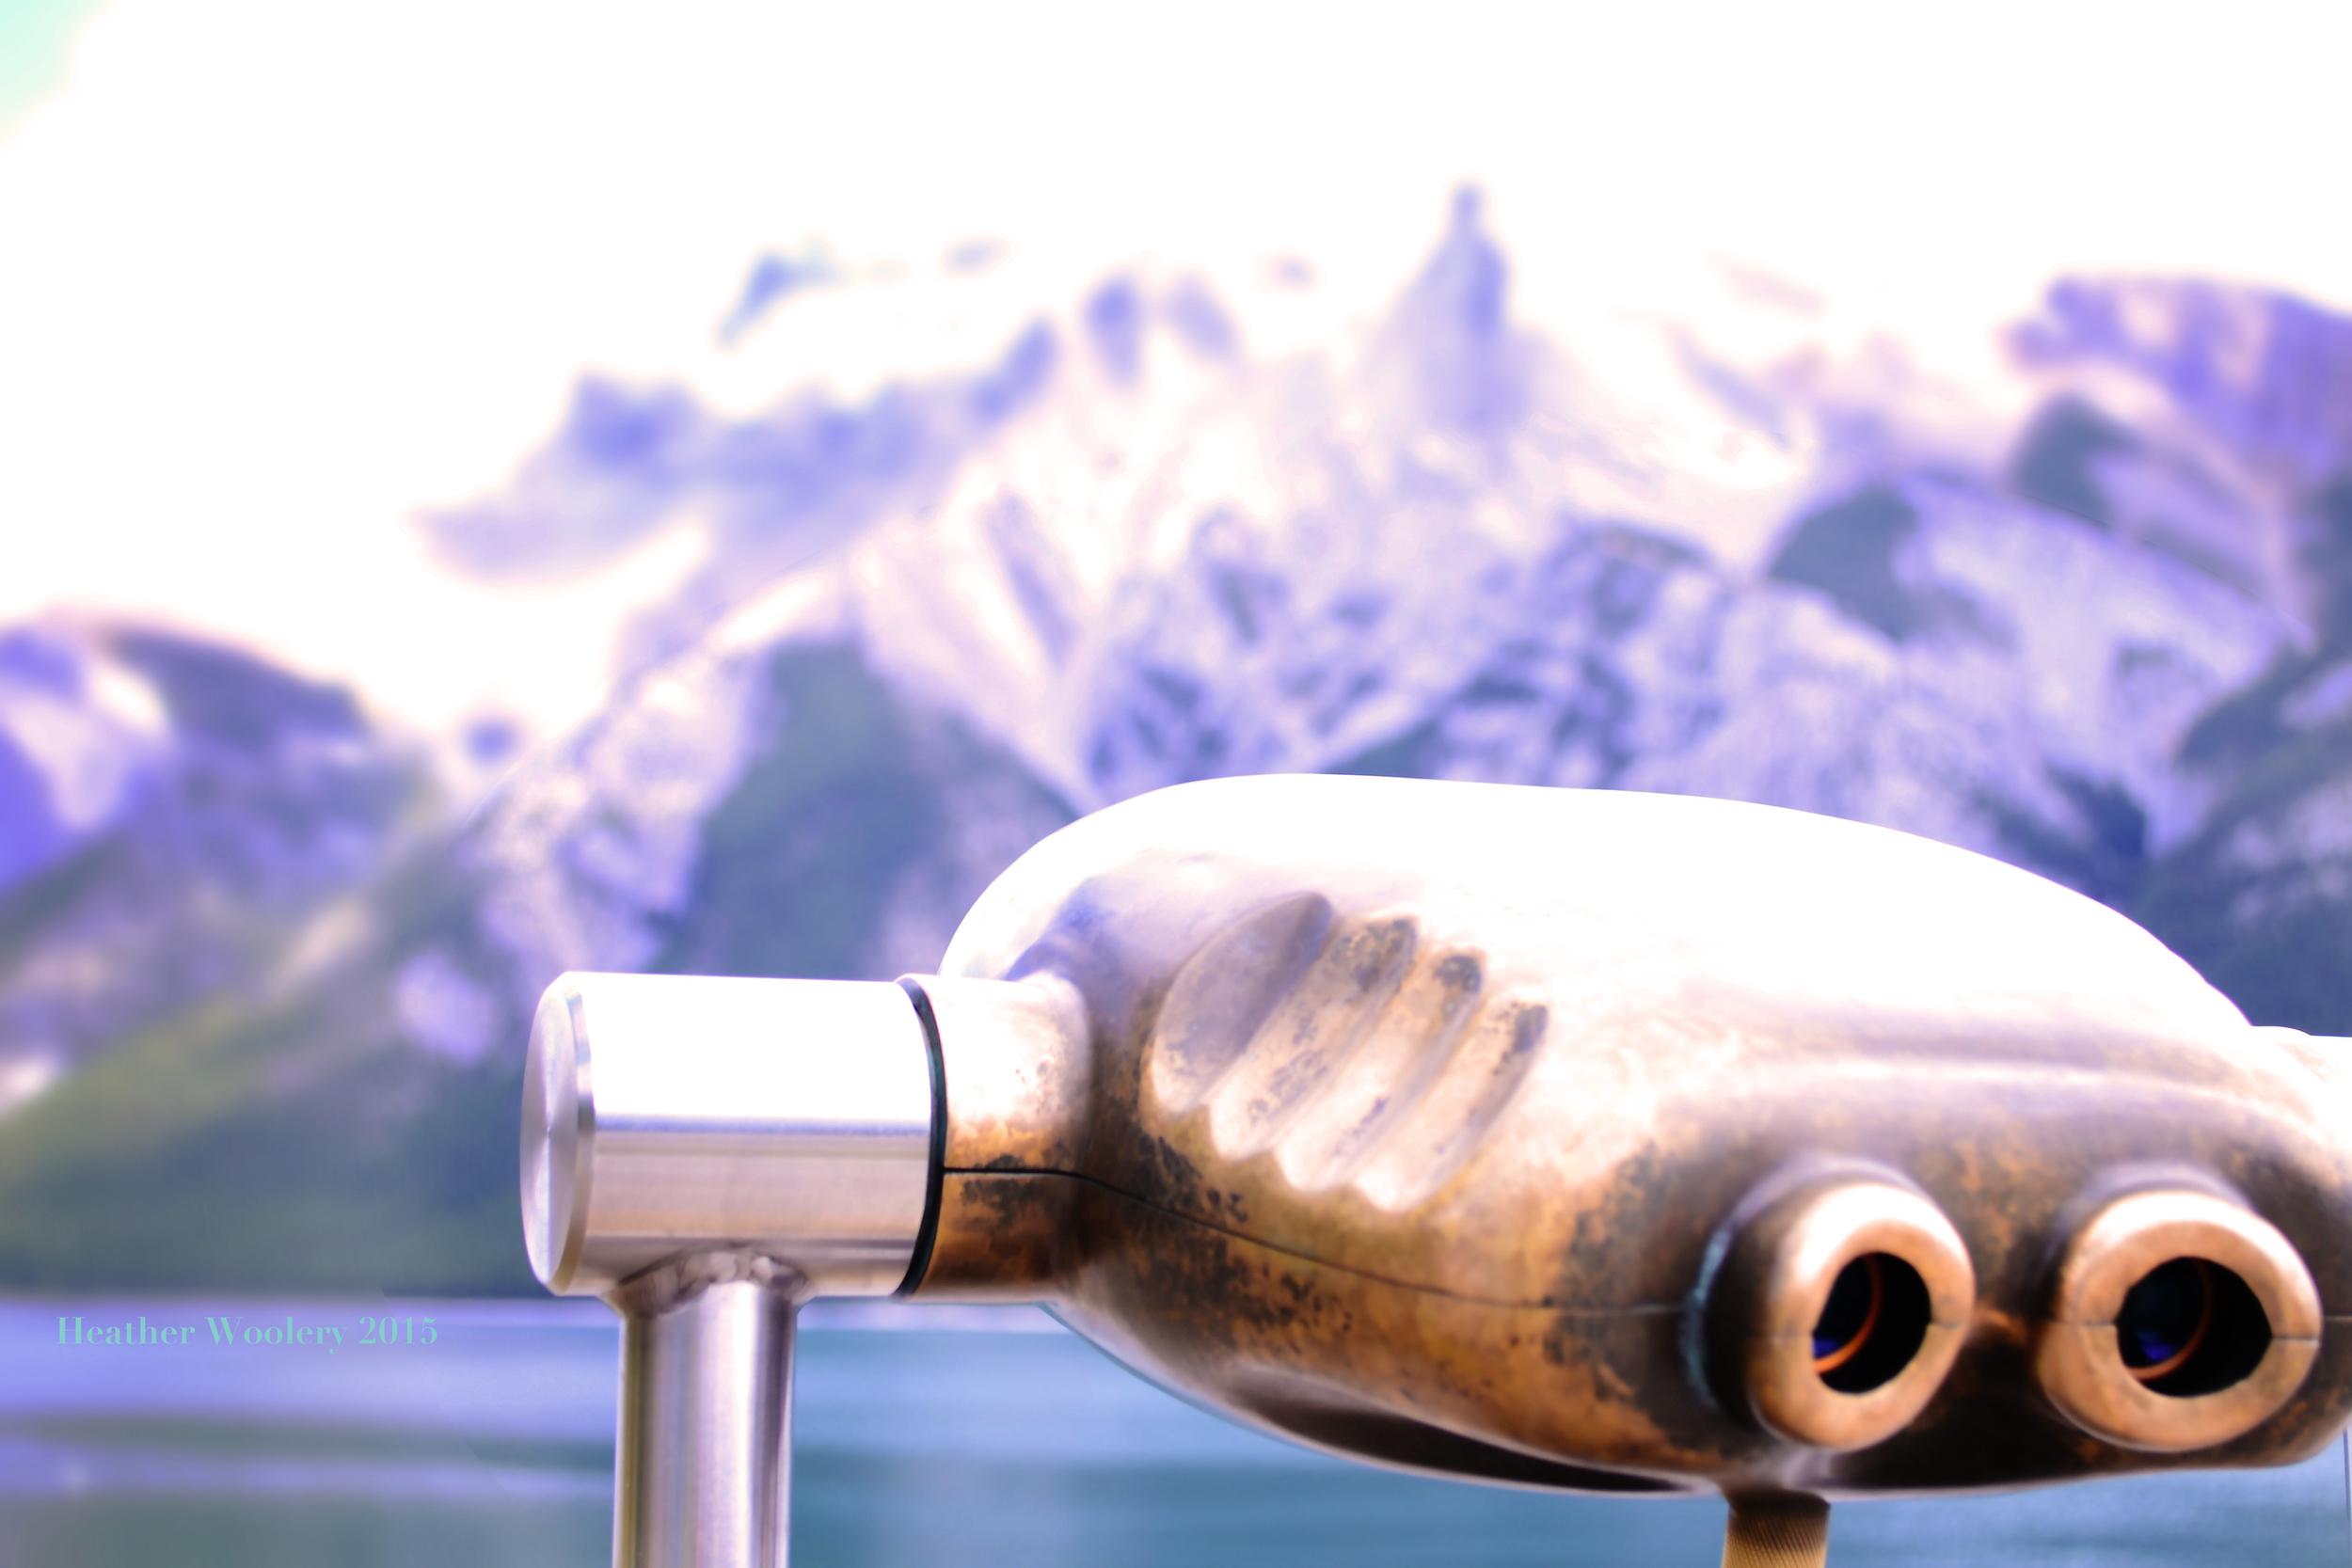 Lake Minniwonka Viewer | Banff, Alberta Canada | 2015 Heather Woolery All Rights Reserved